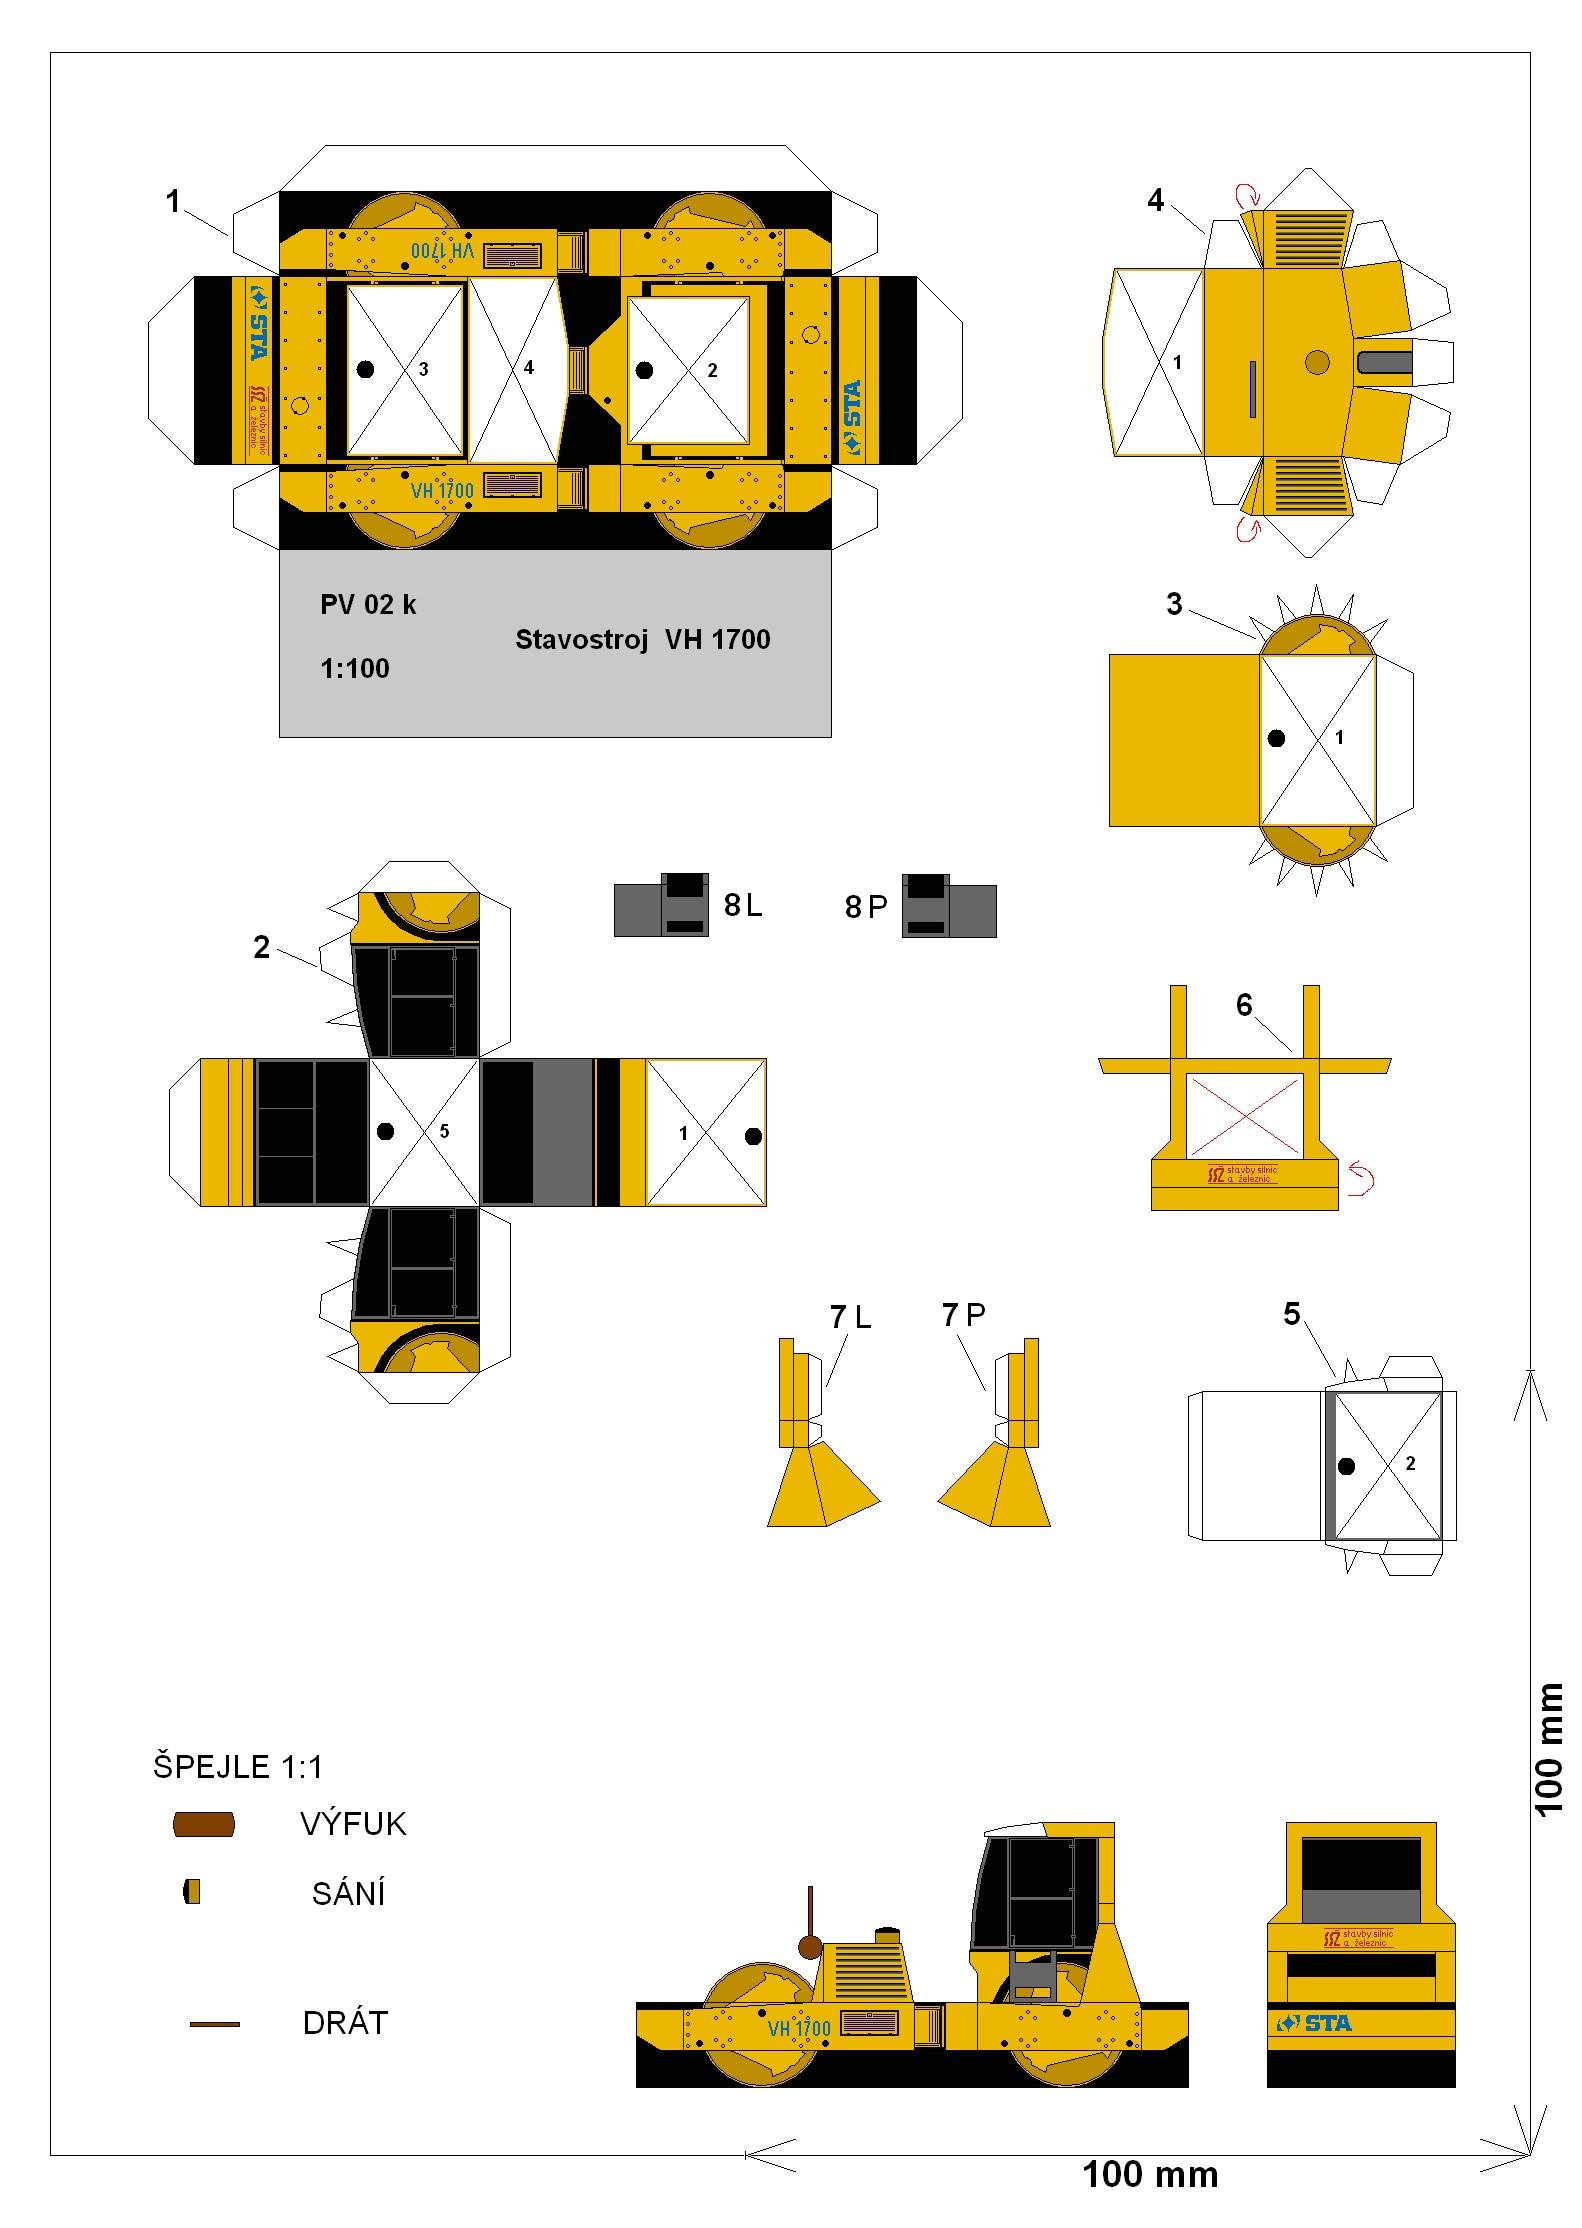 Papercraft Diorama Pv 02 K Png 1582—2228 Misha Pinterest